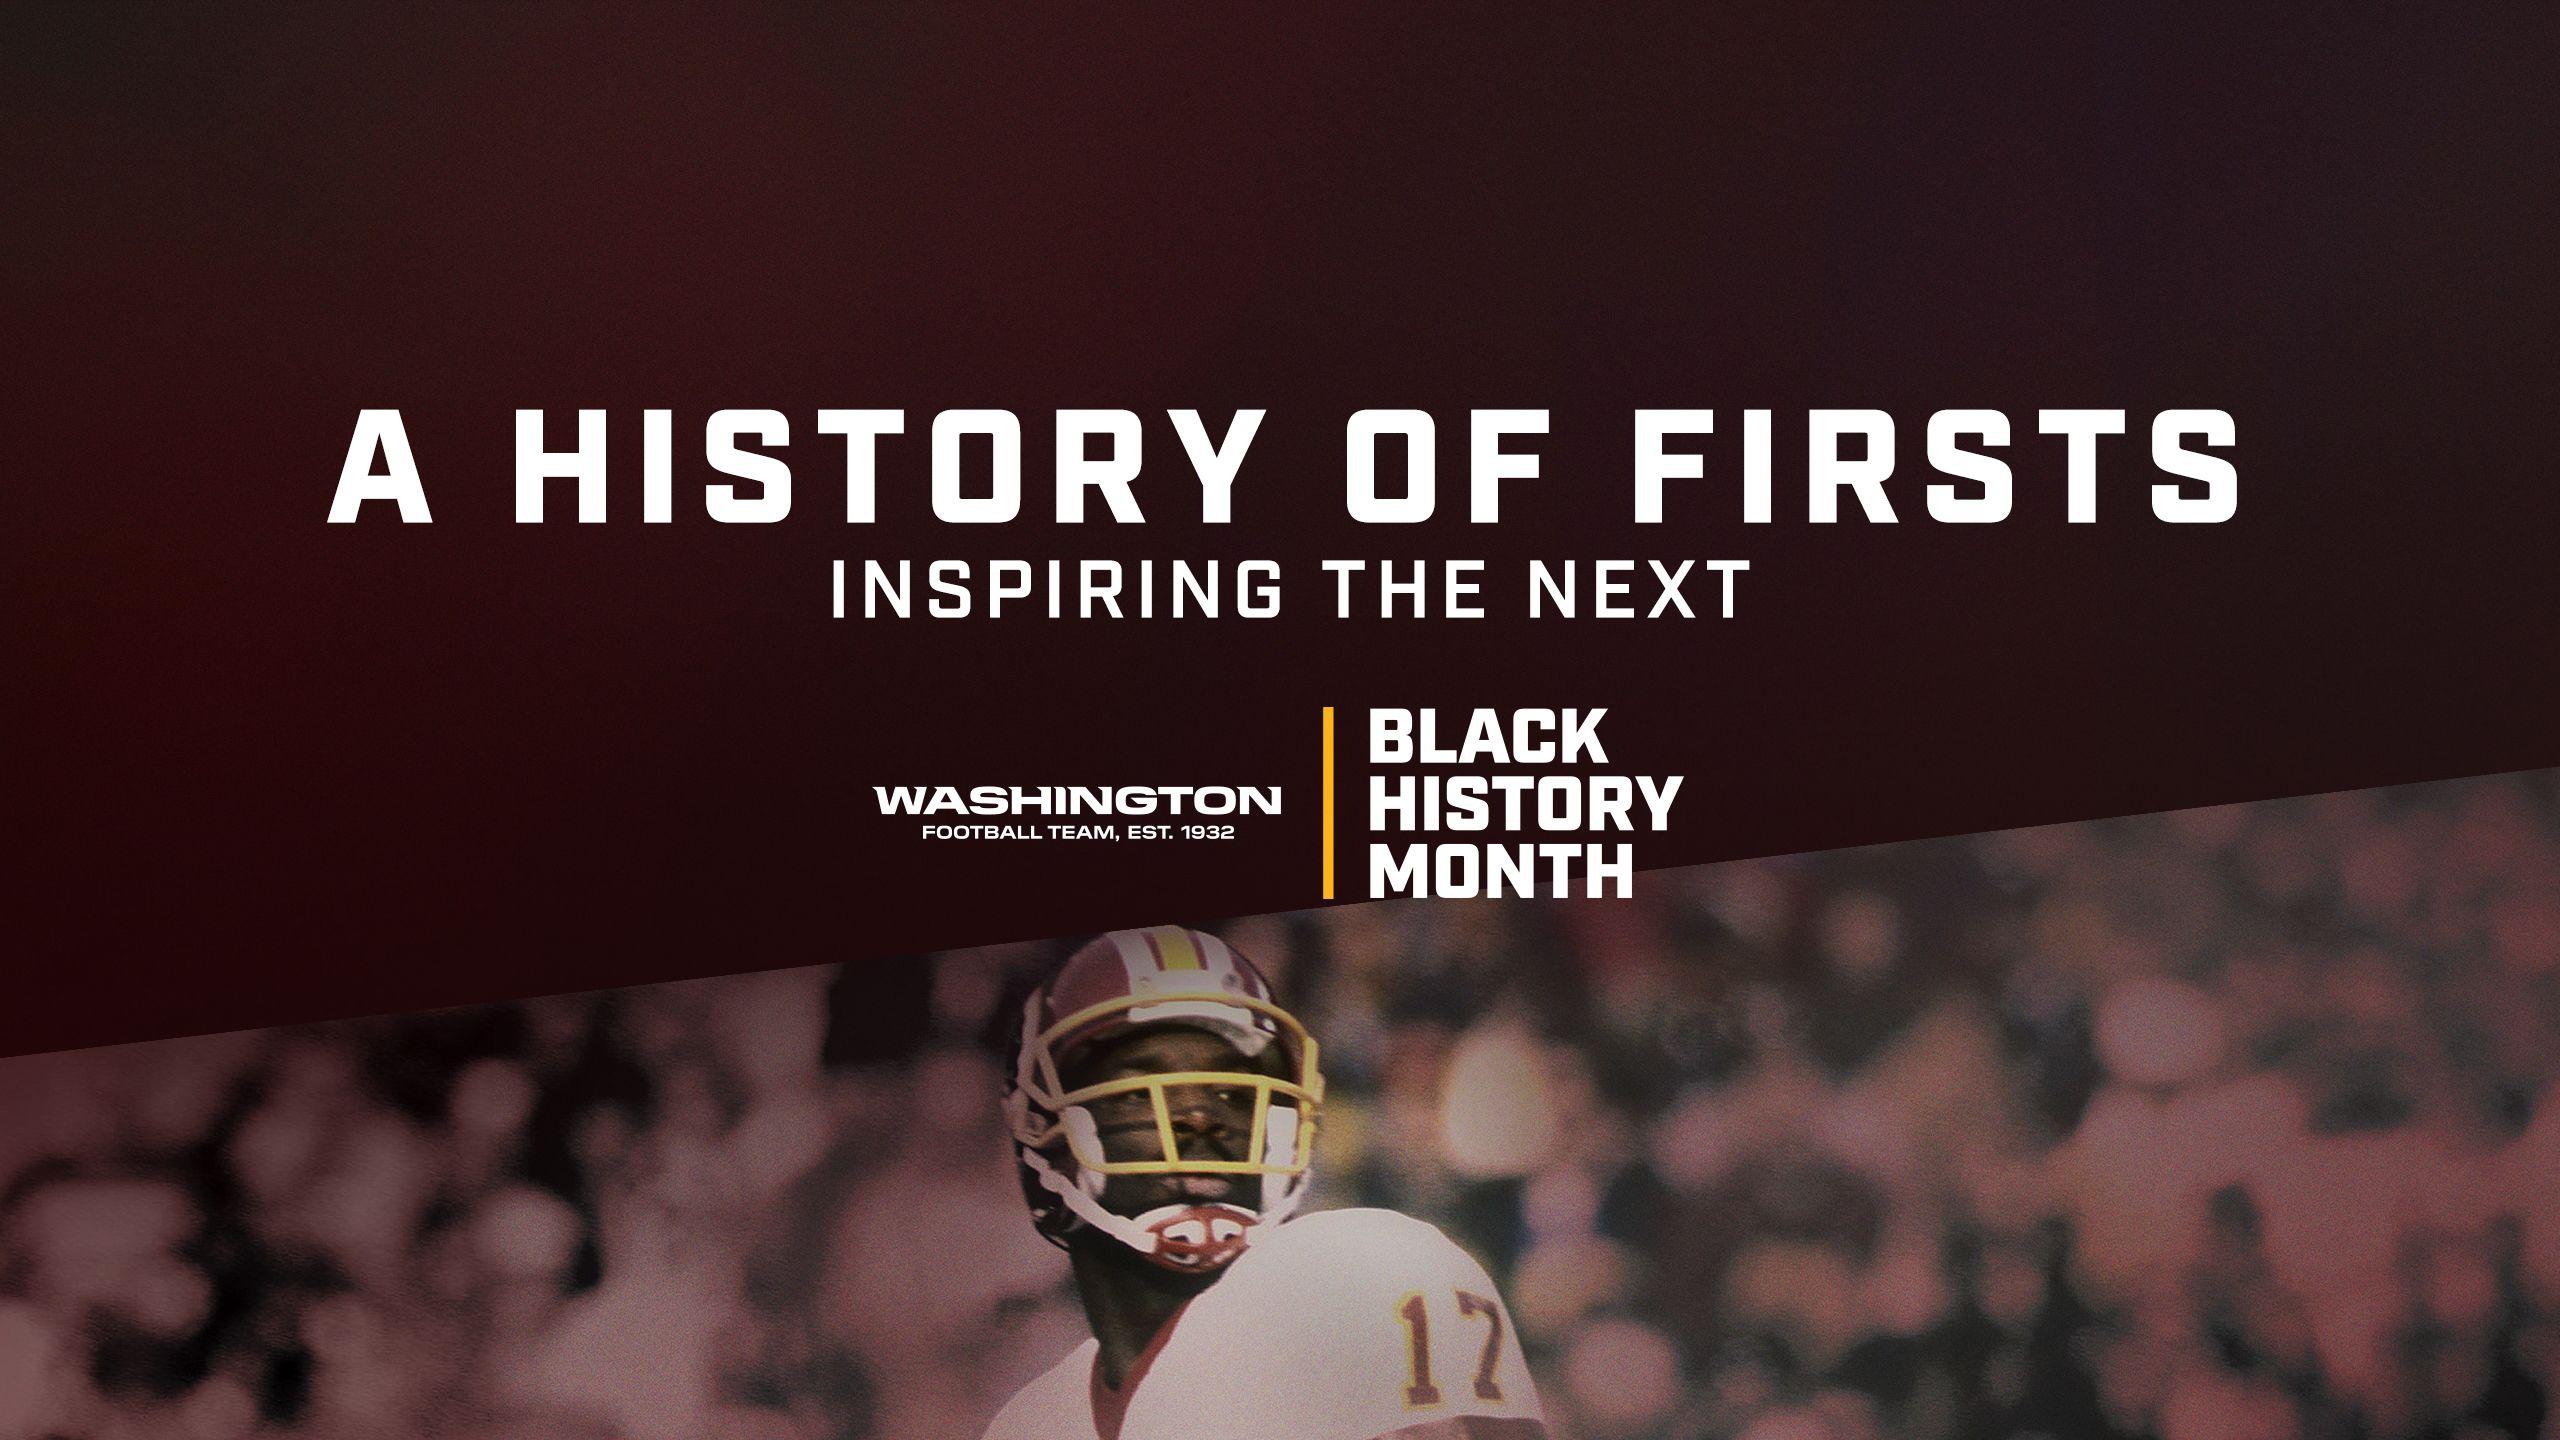 Black History Month: Inspiring The Next